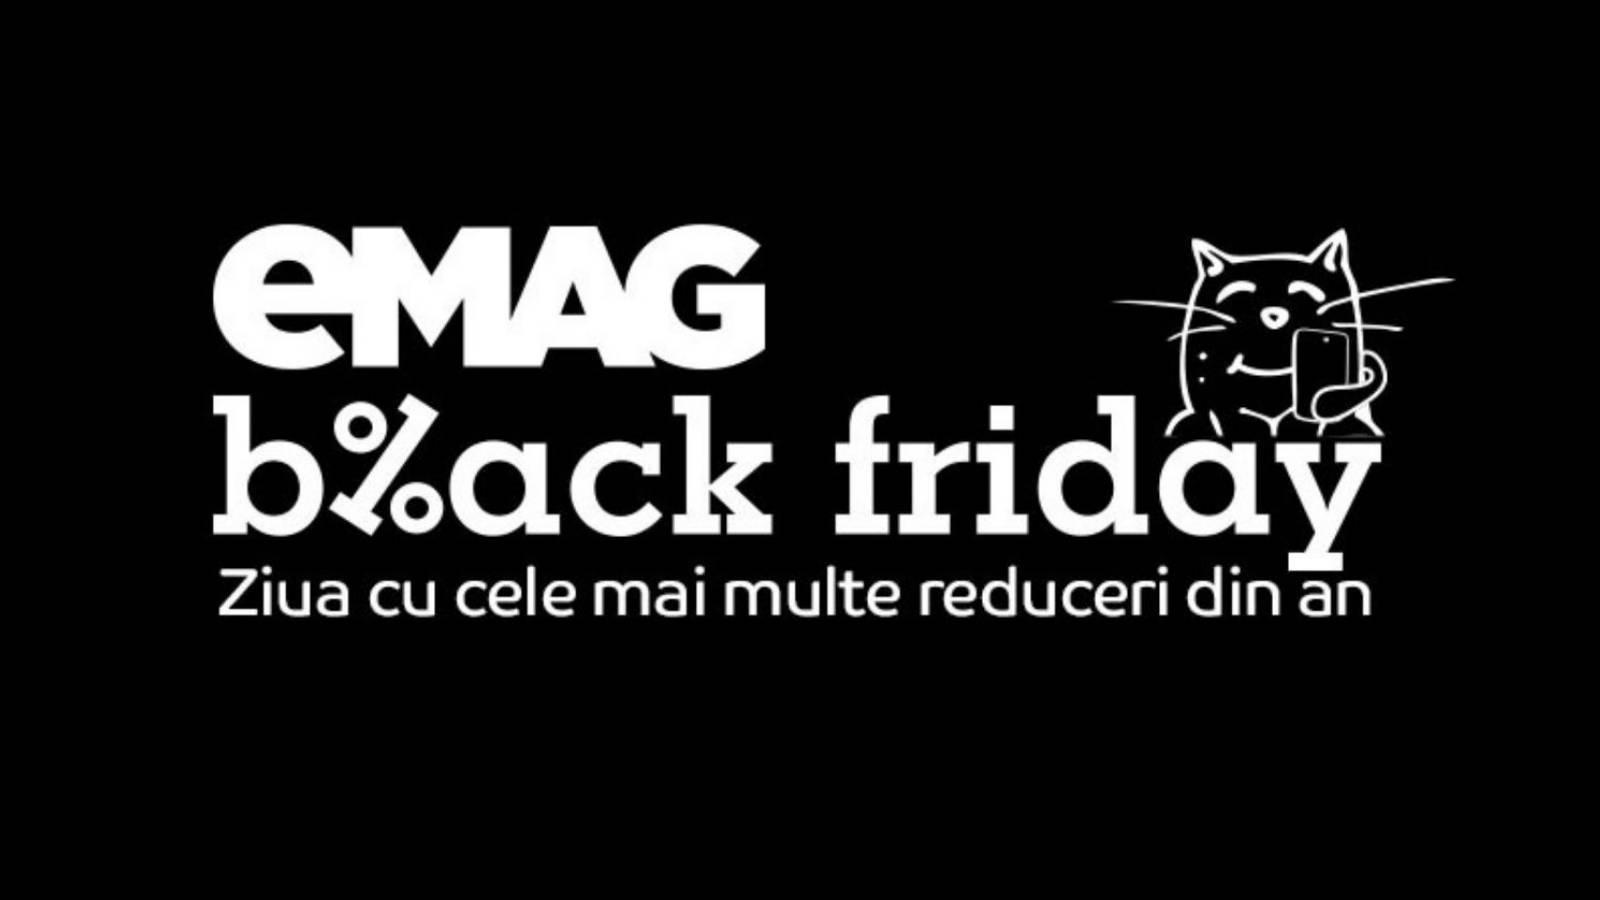 eMAG Produse BLACK FRIDAY 2019